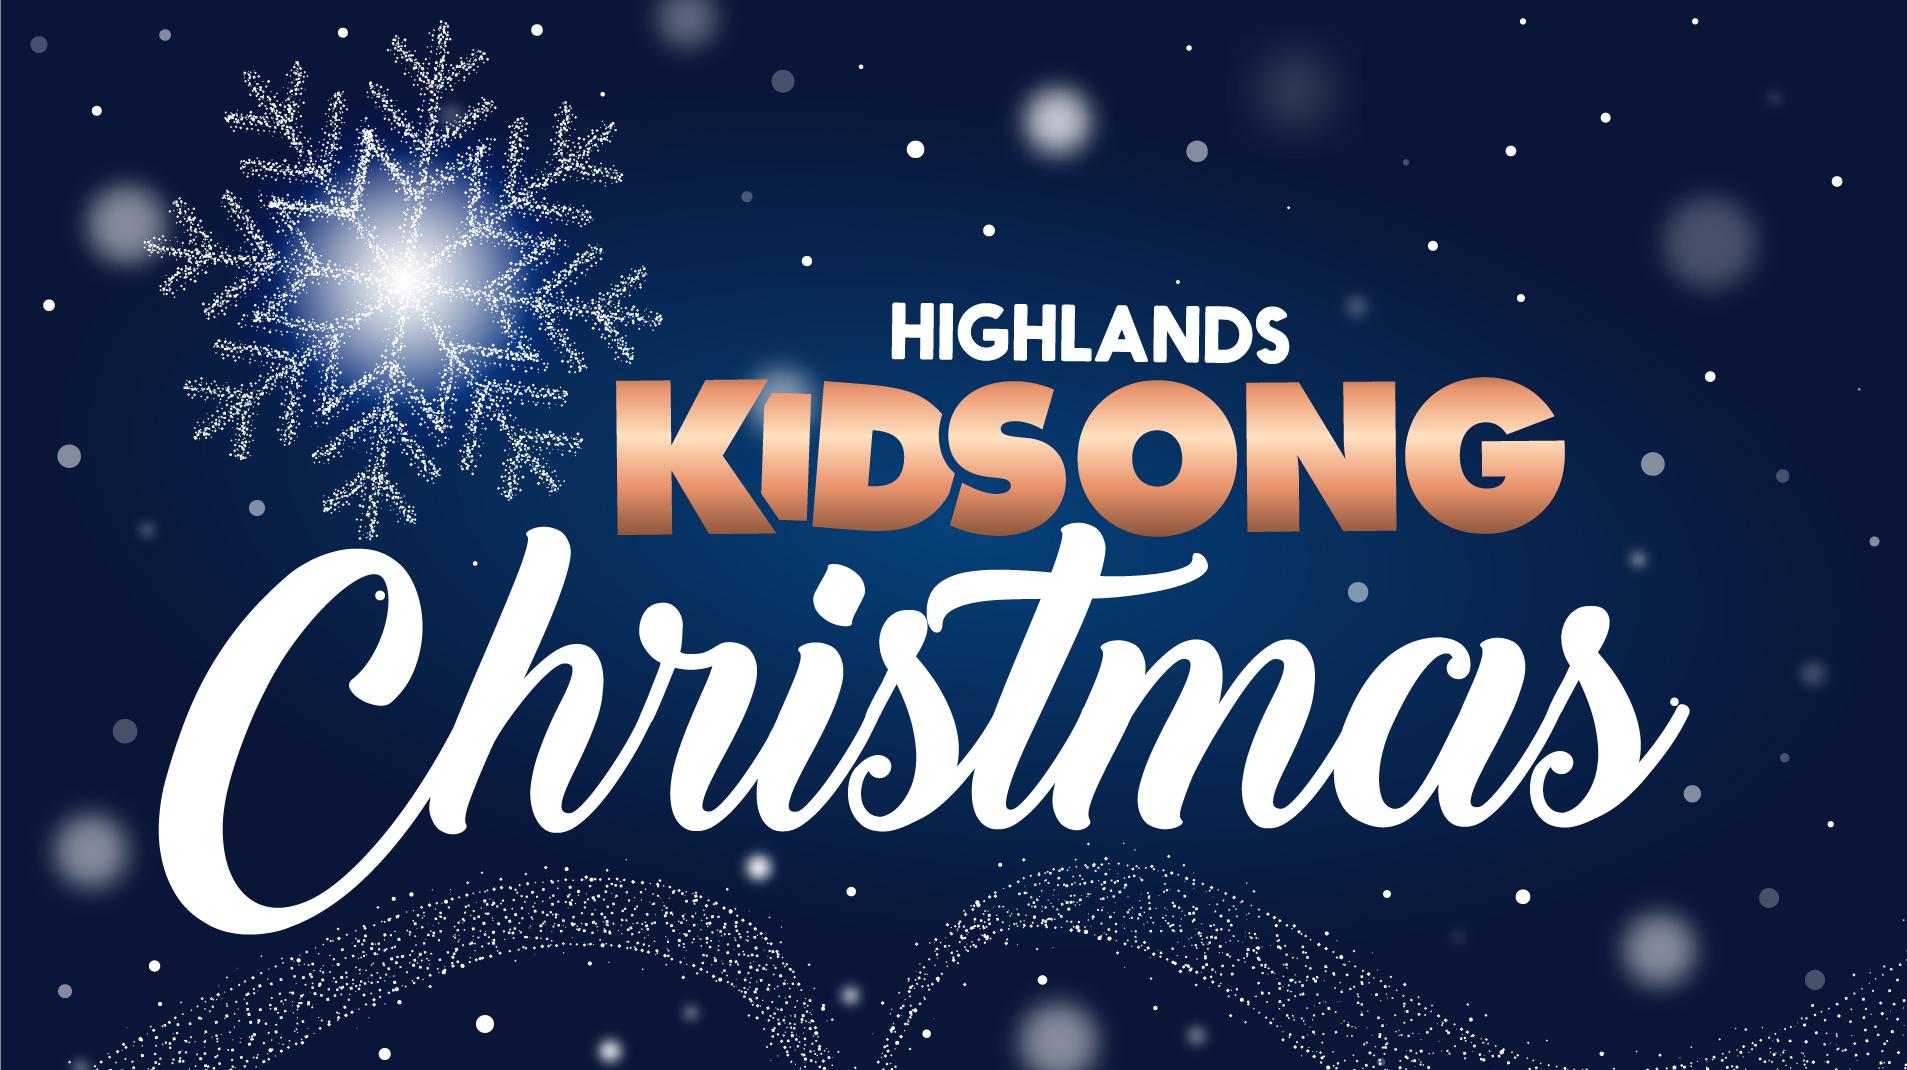 KidSong Christmas on Livestream